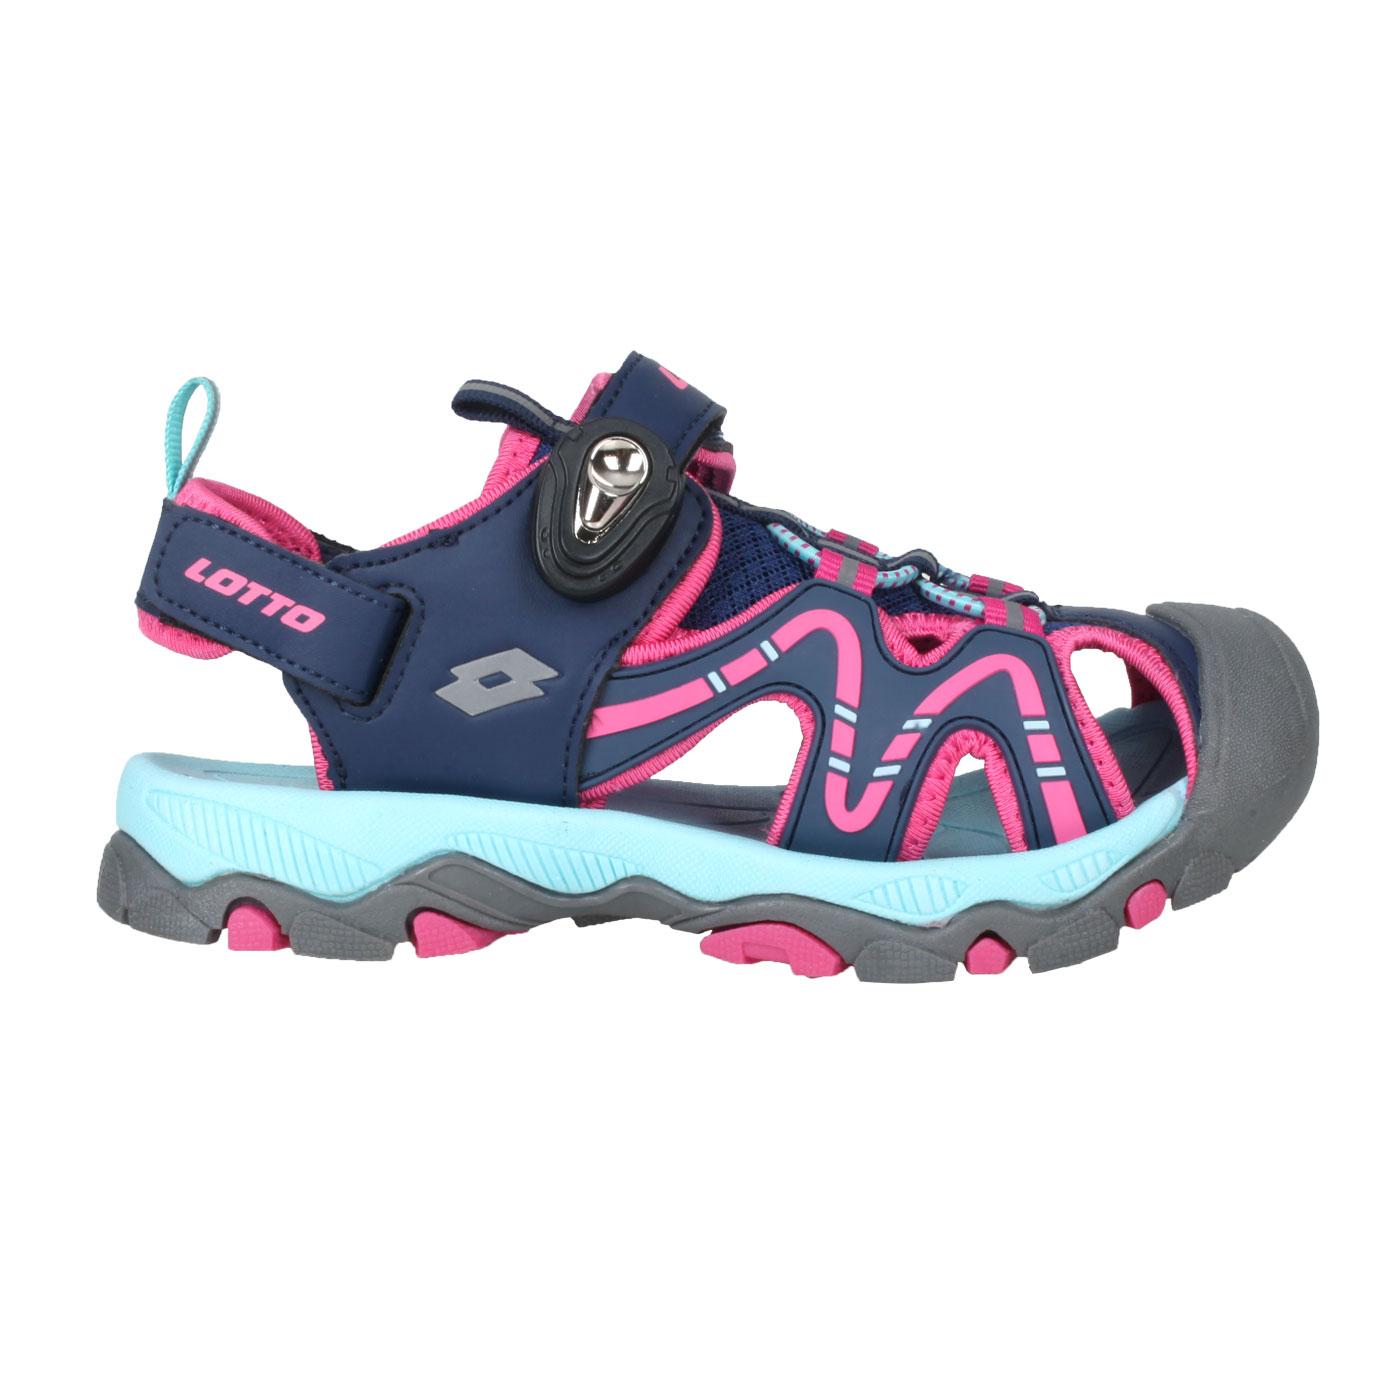 LOTTO 大童磁扣護趾涼鞋 LT1AKS3383 - 藍桃紅水藍